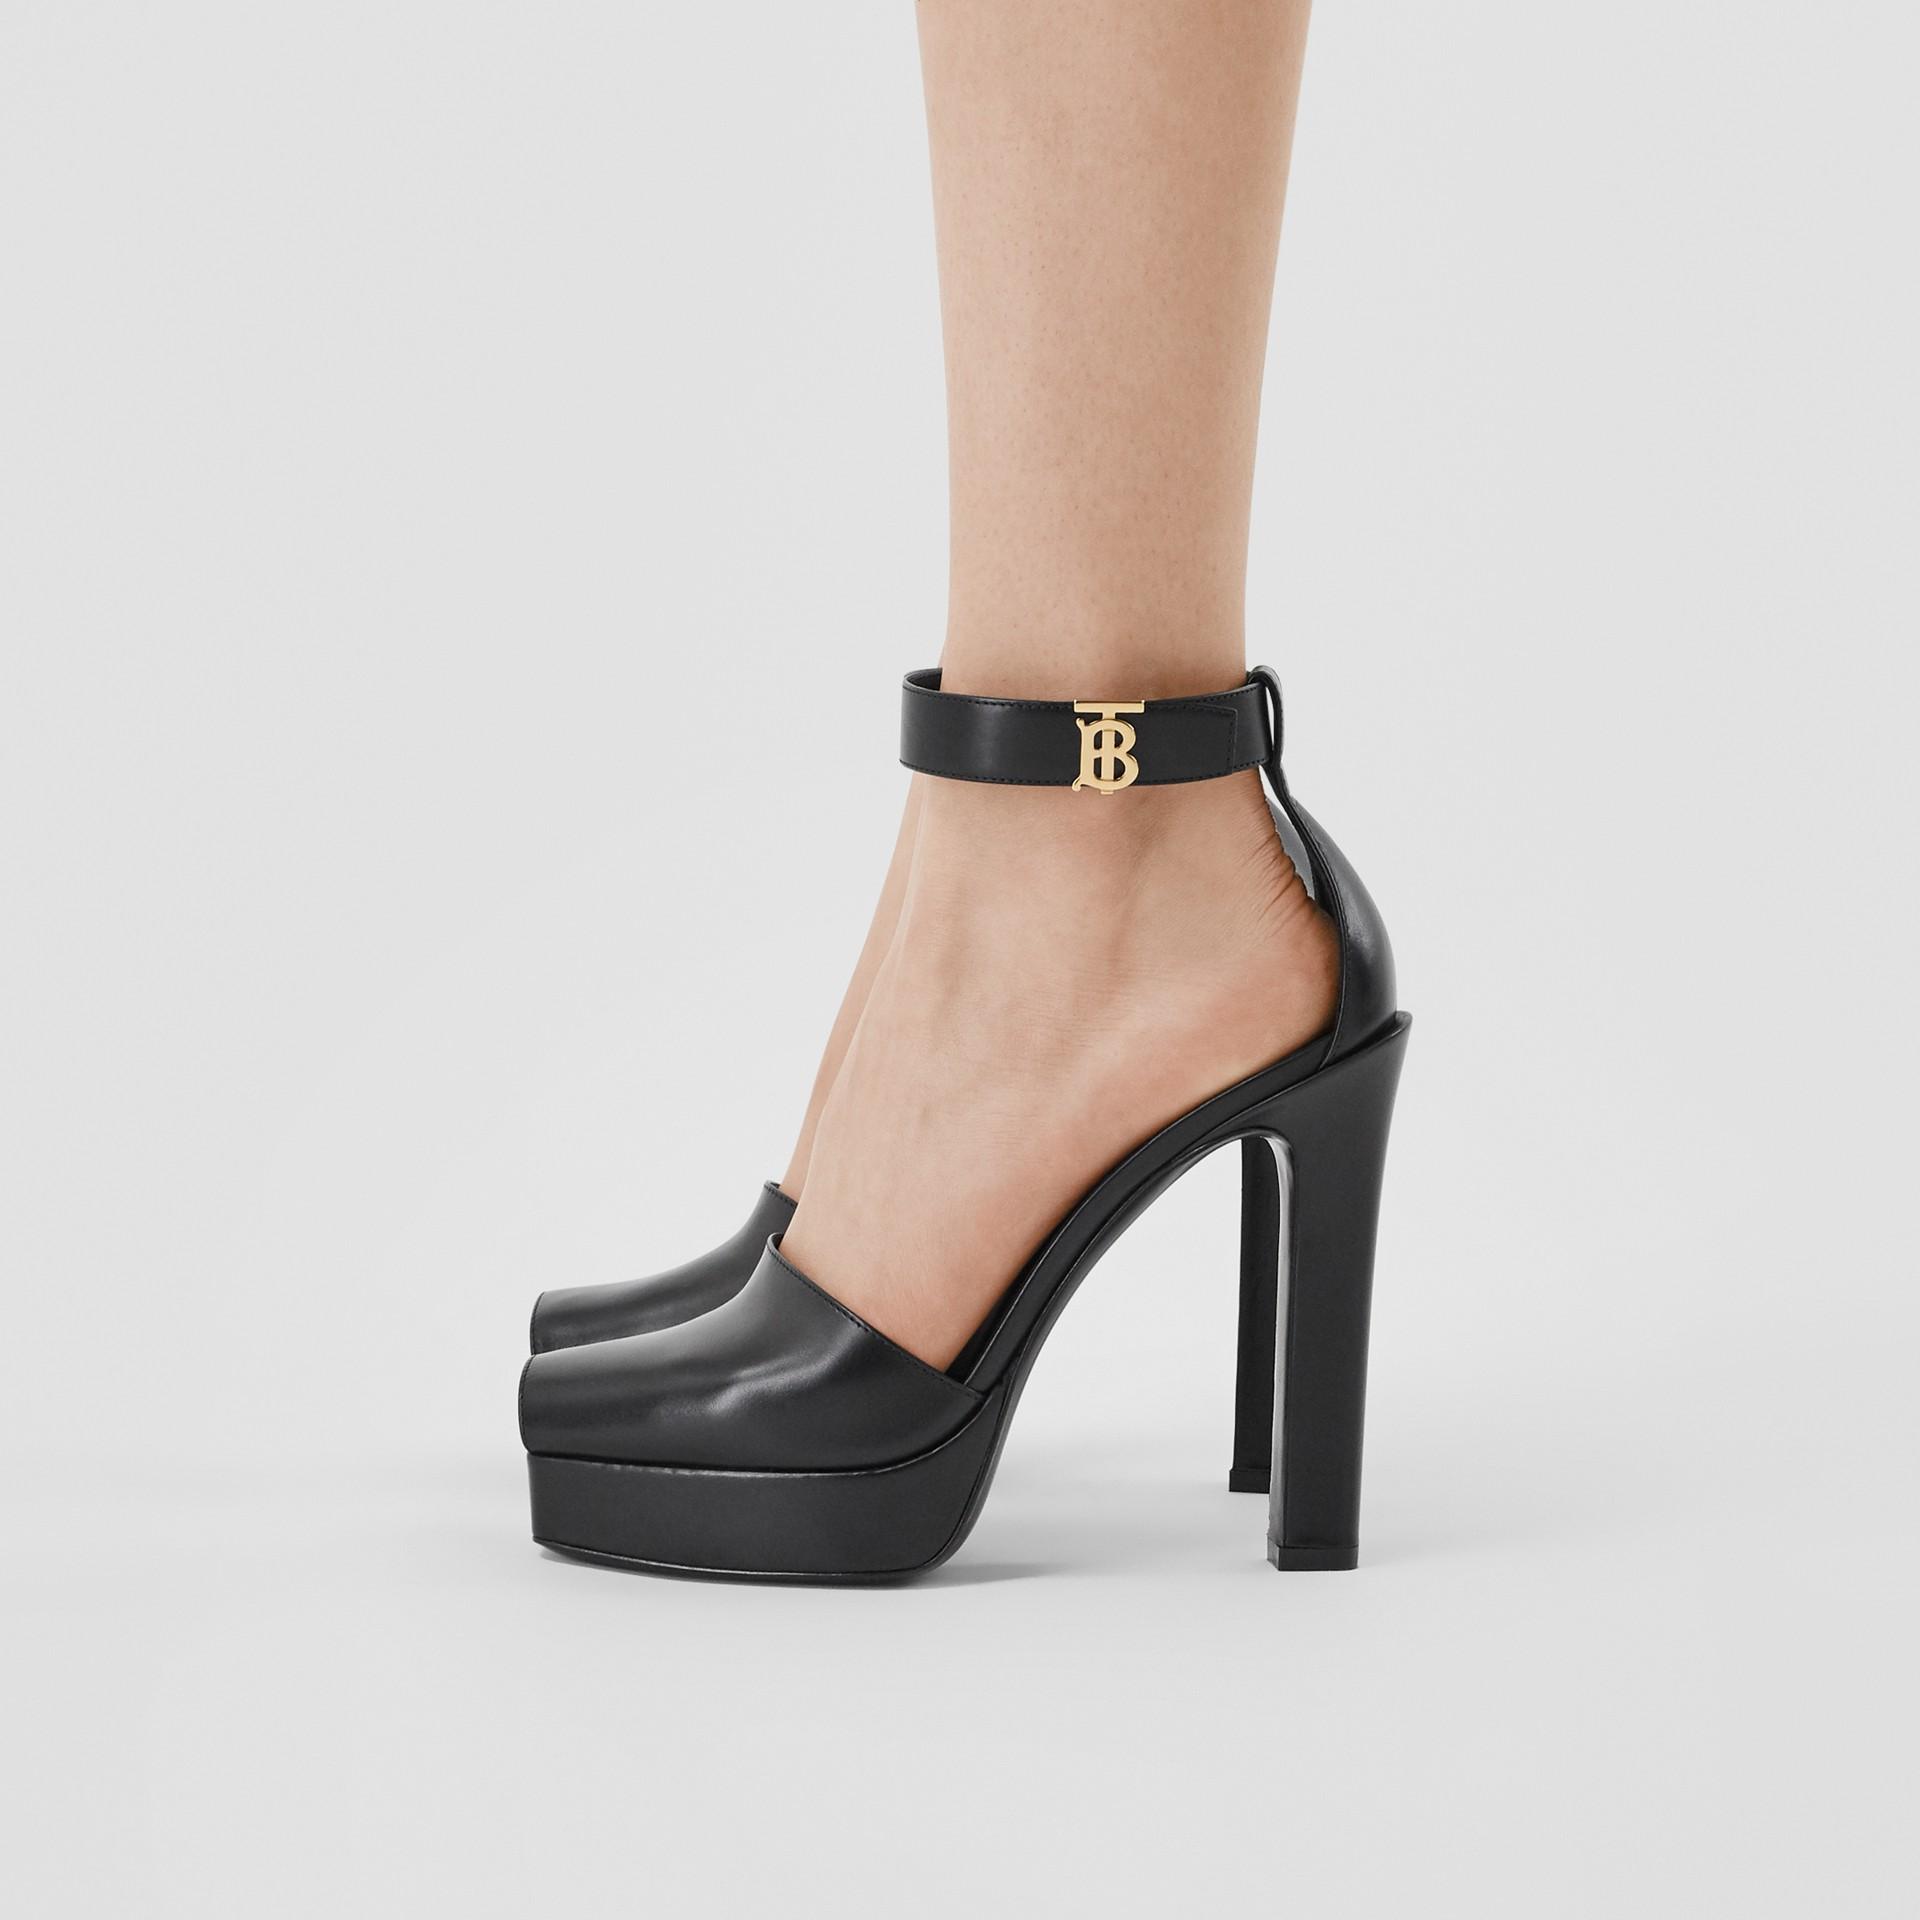 Monogram Motif Leather Peep-toe Sandals in Black - Women | Burberry - gallery image 2